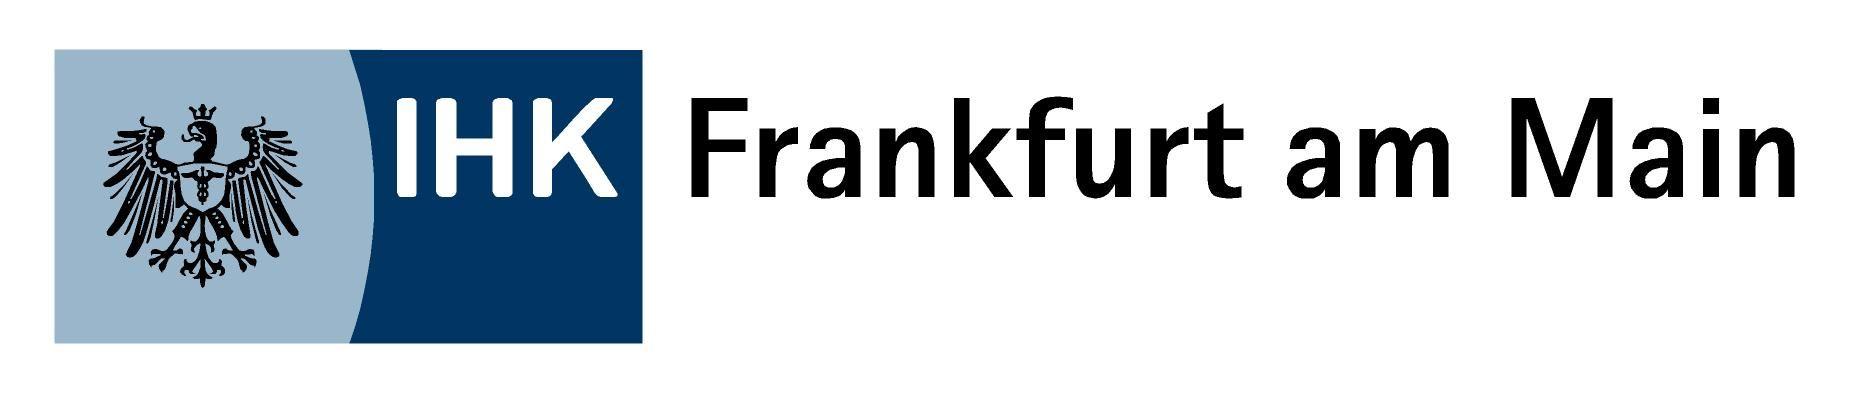 IHK FFM groß_20070829